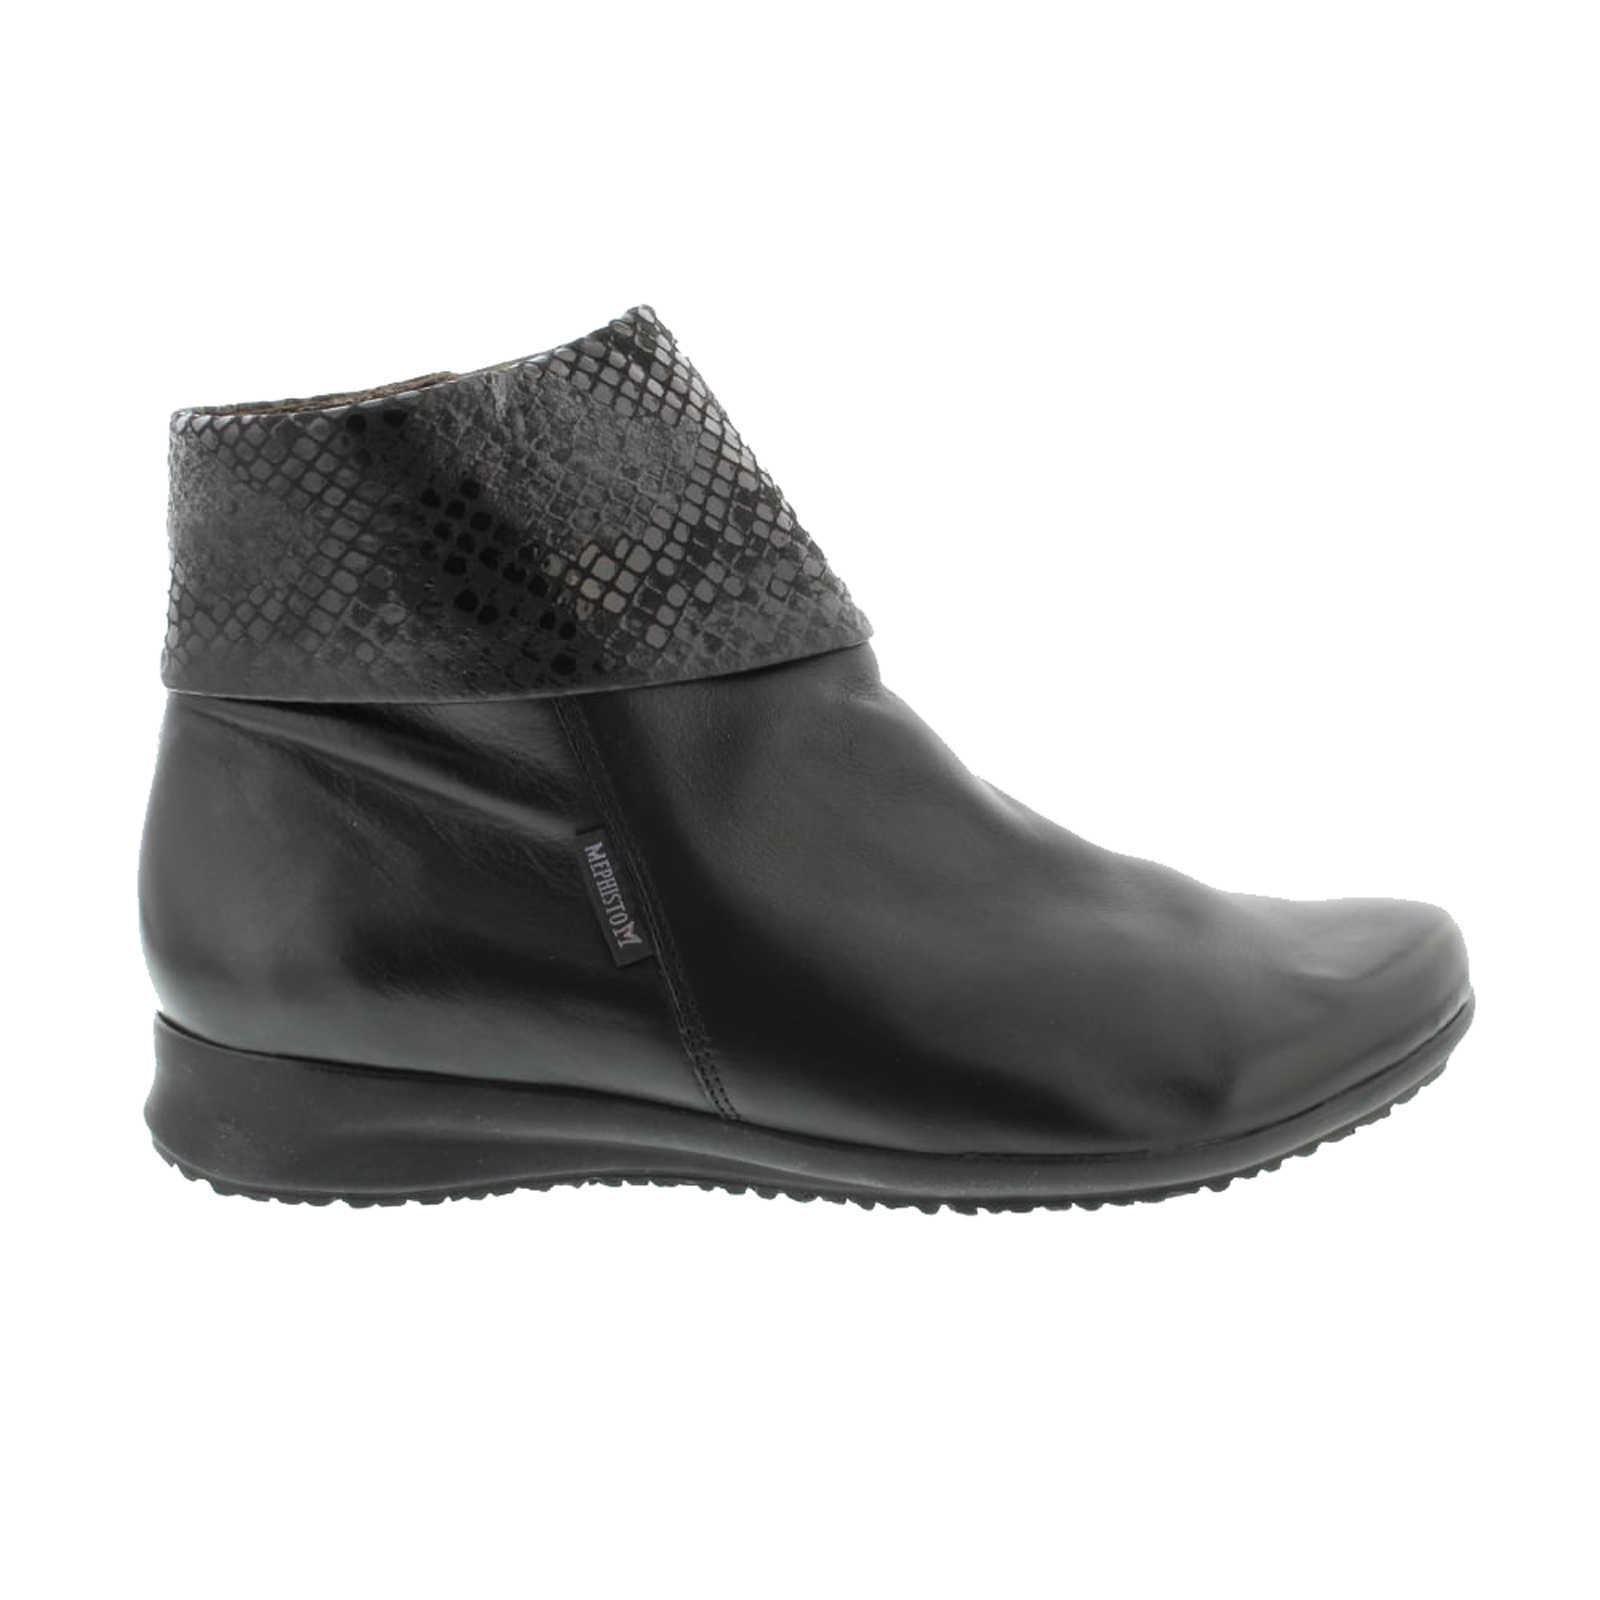 Mephisto Fiducia Black Womens Boots